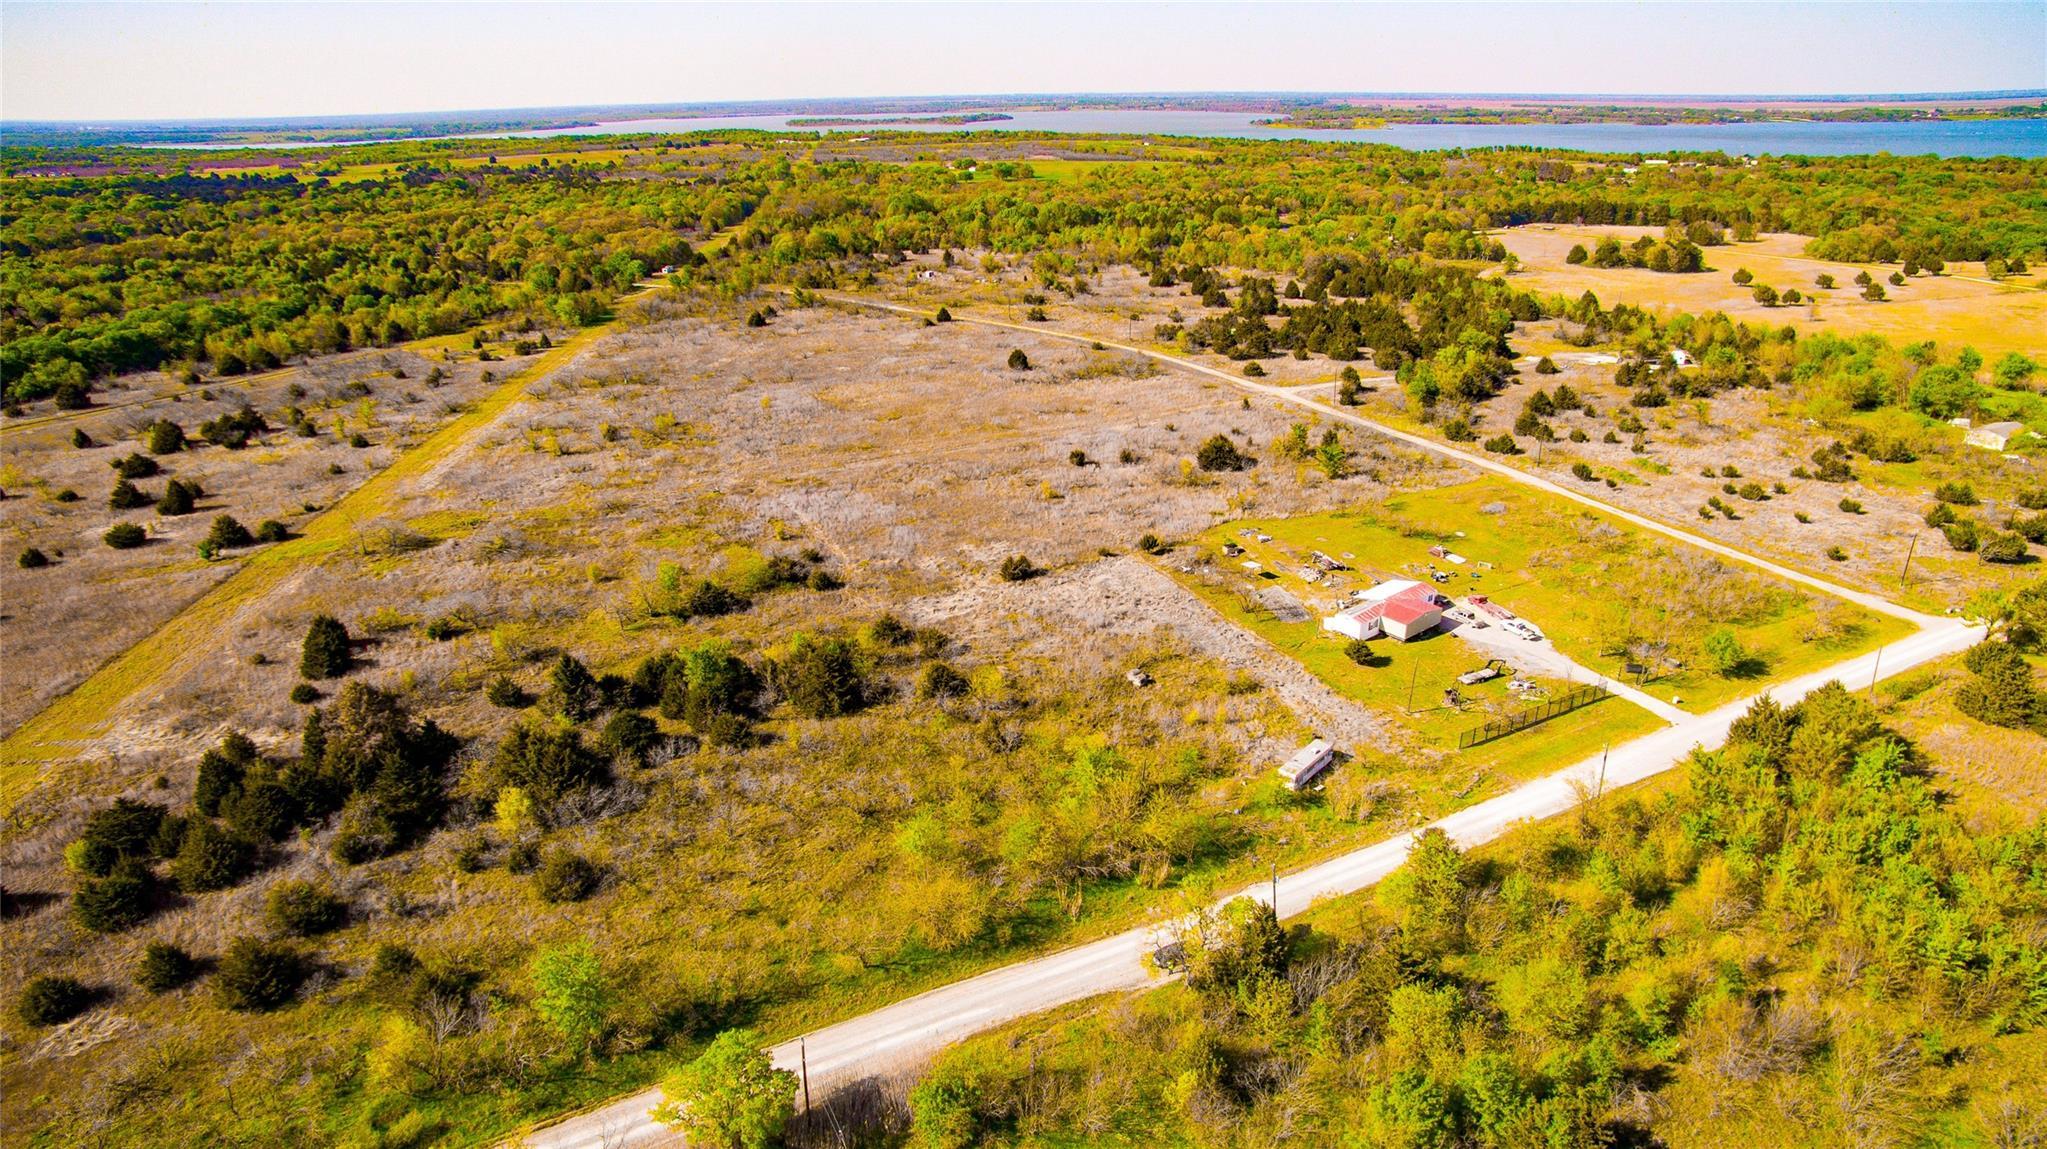 1 S E County Rd 3060 Property Photo - Corsicana, TX real estate listing